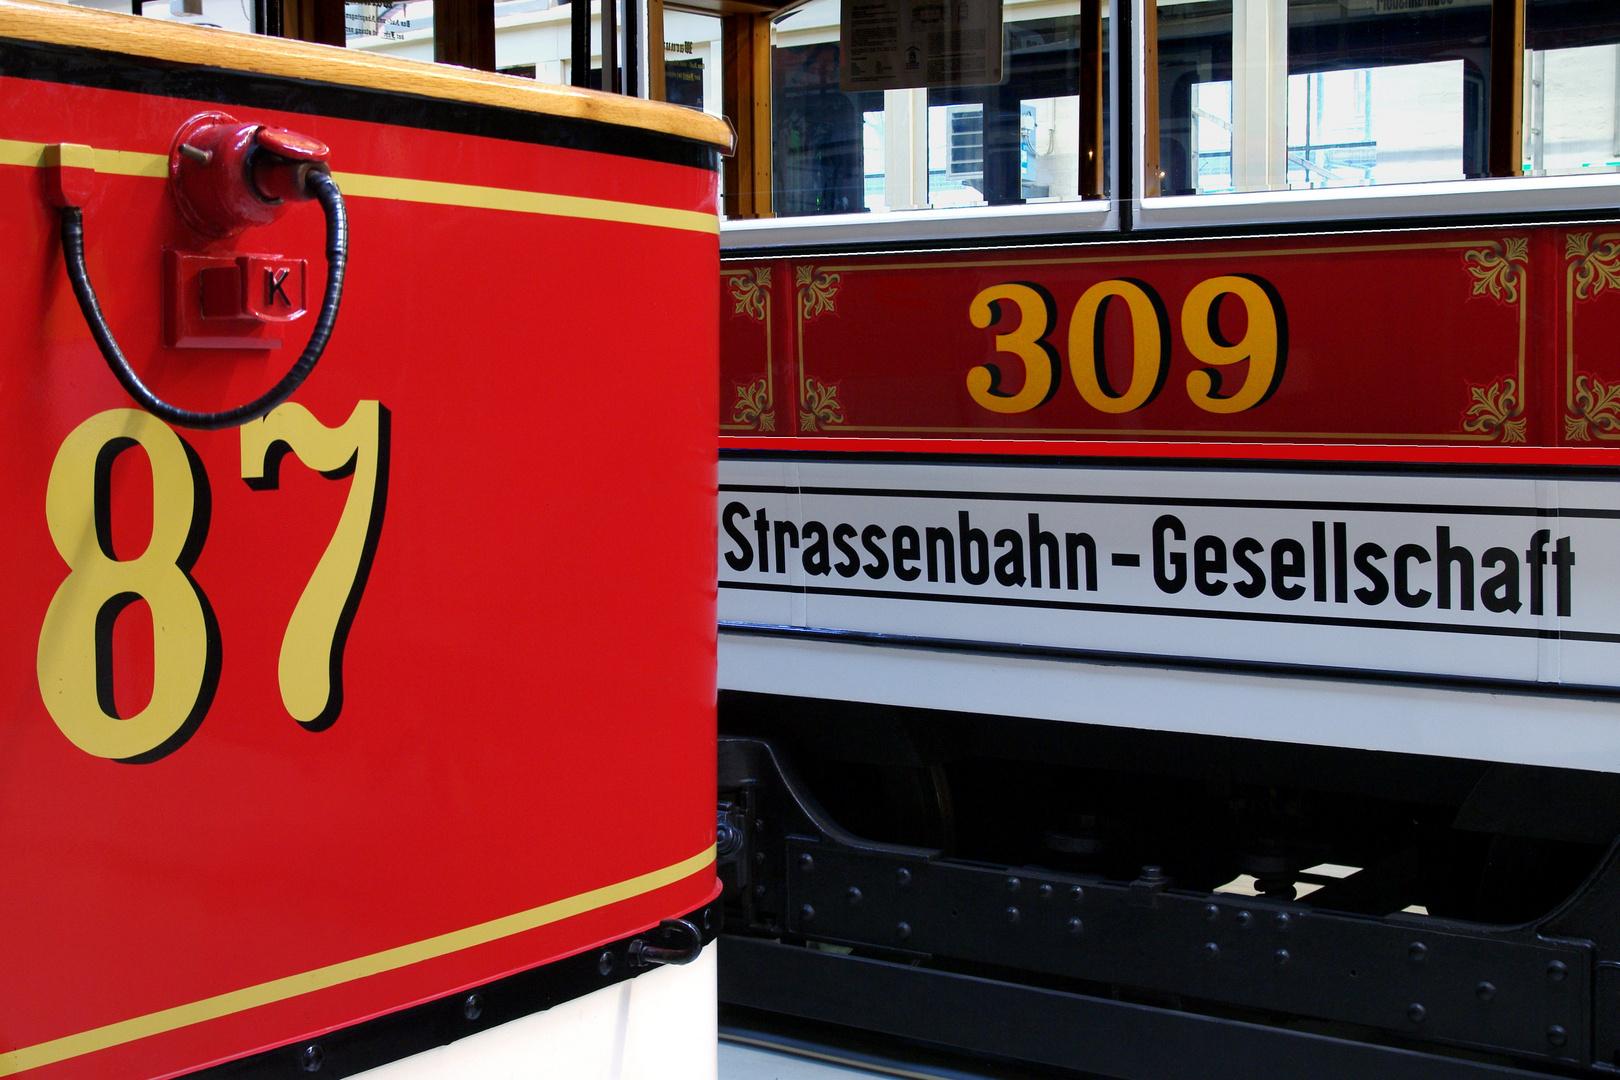 stra enbahnmuseum dresden tag der offenen t r foto bild bus nahverkehr stra enbahnen. Black Bedroom Furniture Sets. Home Design Ideas